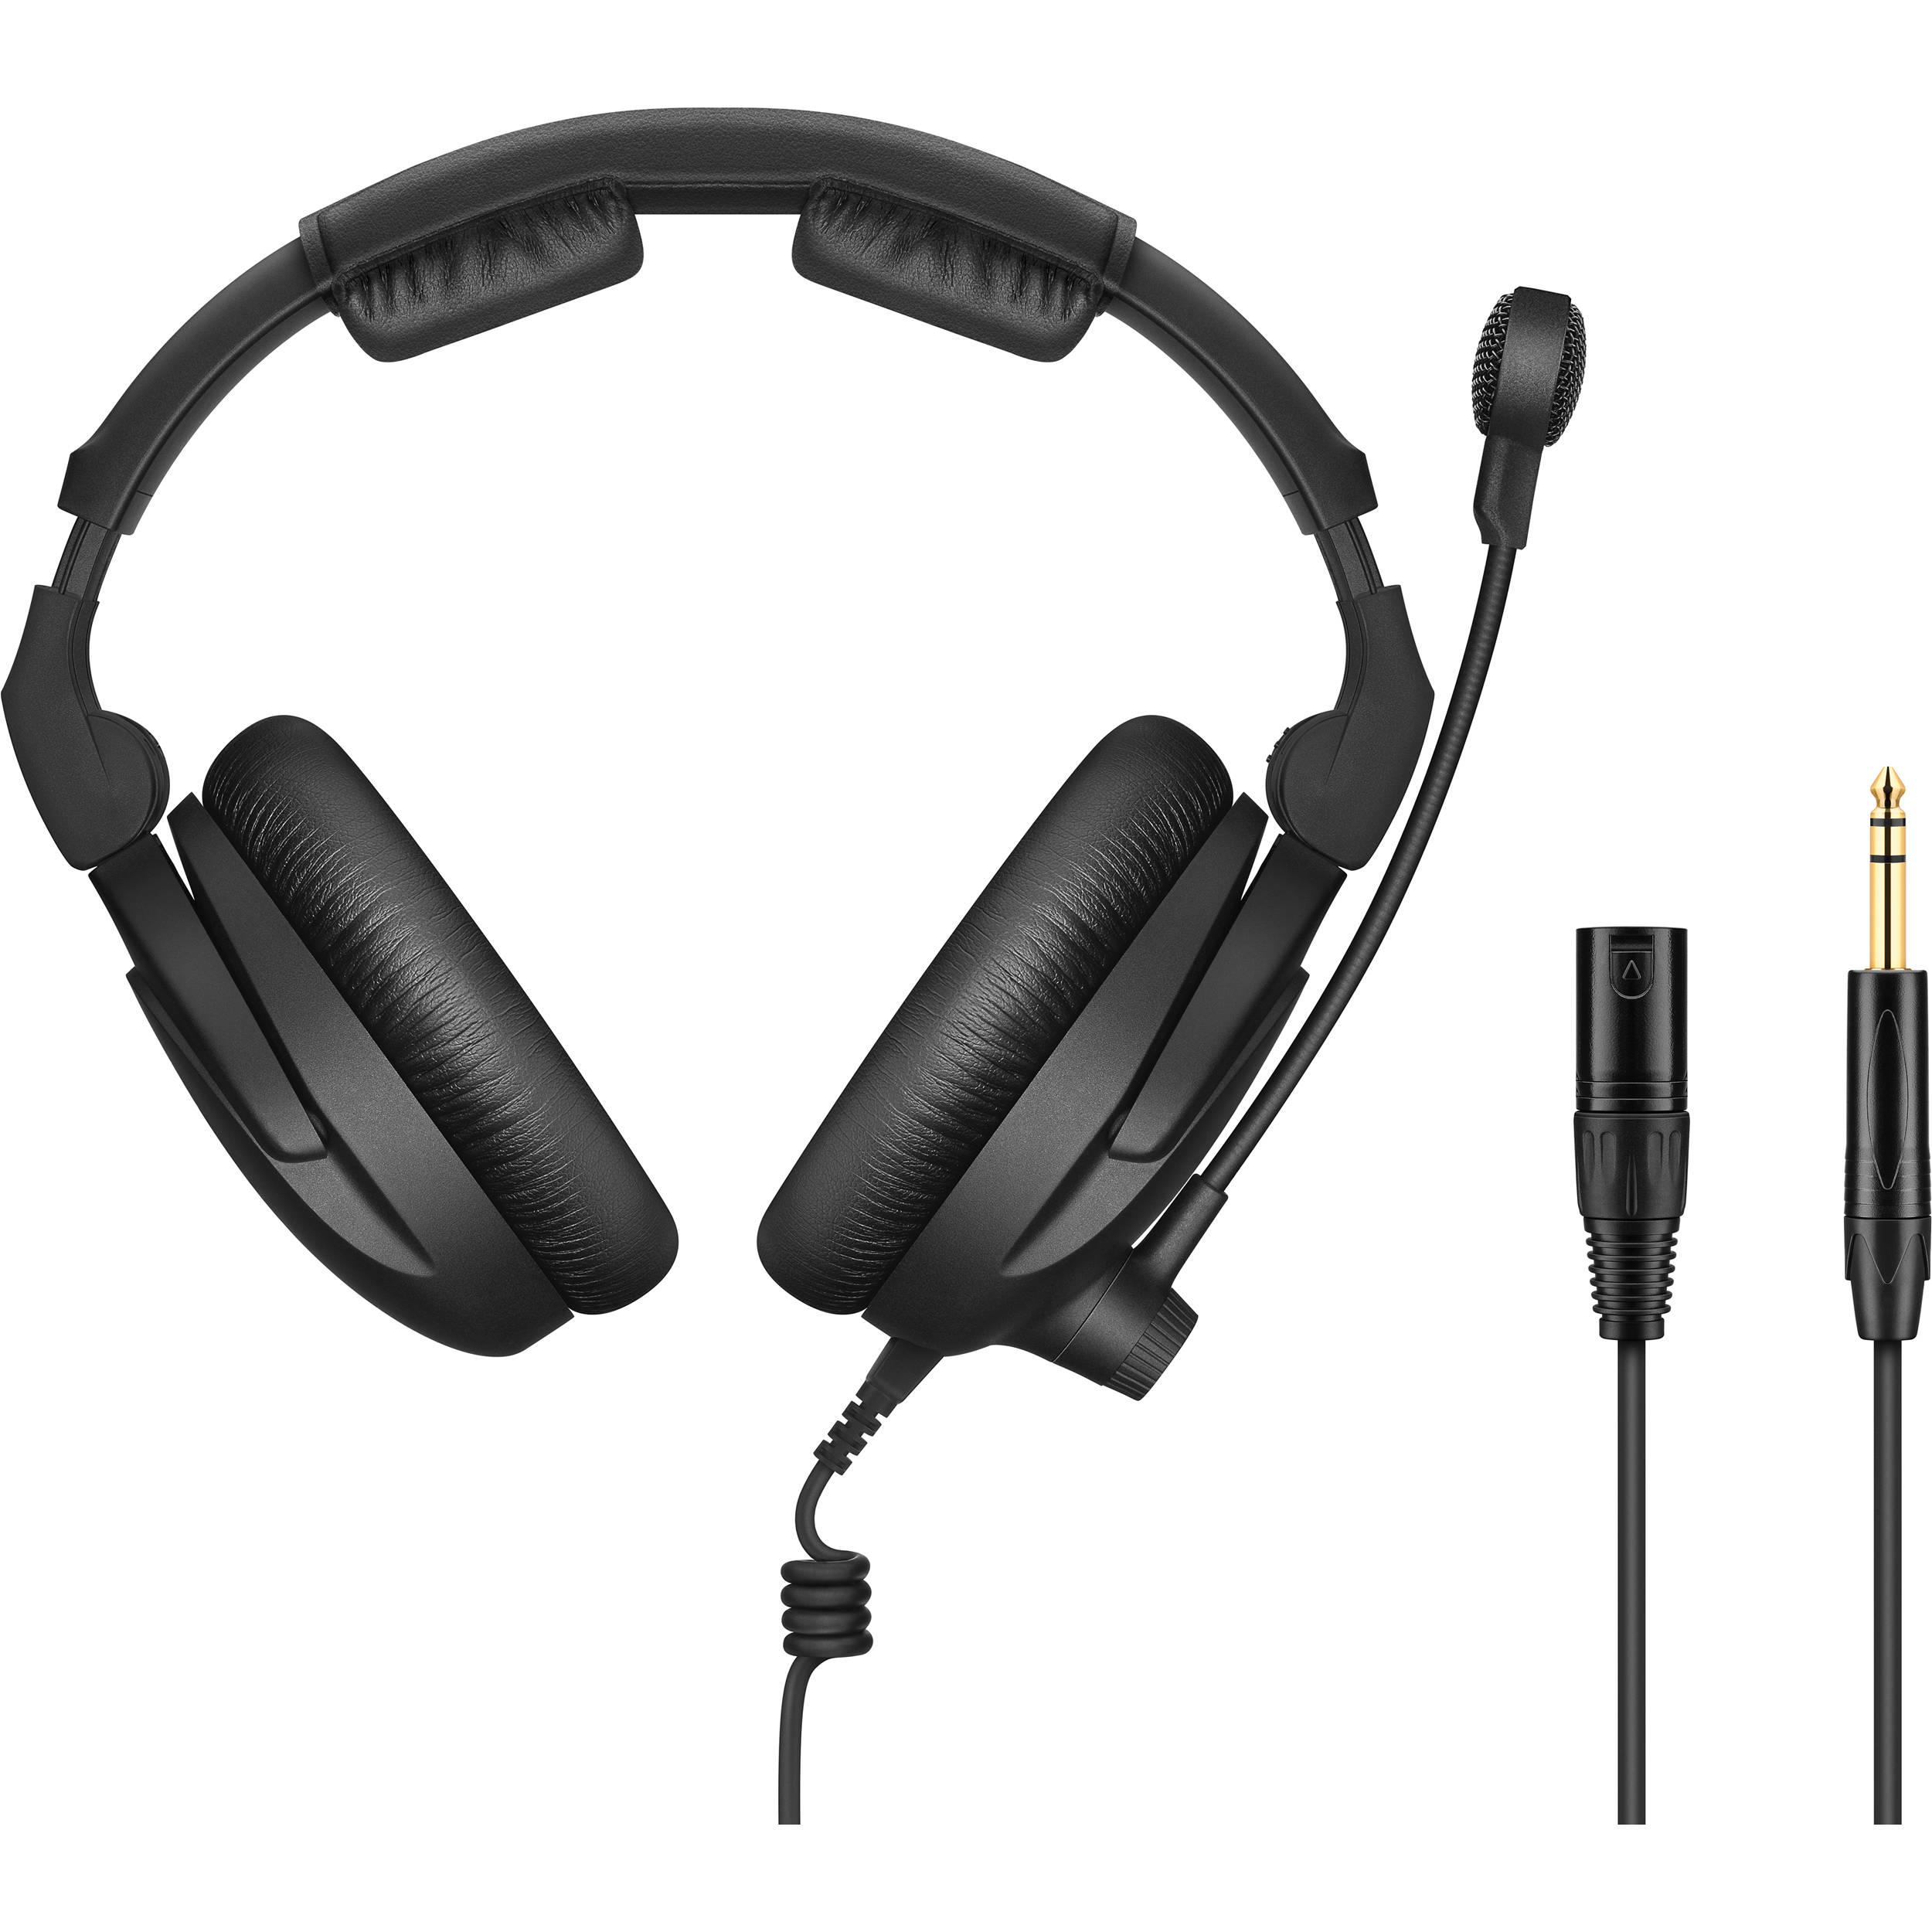 Sennheiser Hmd 300 Xq 2 Headset With Boom Microphone Hmd 300